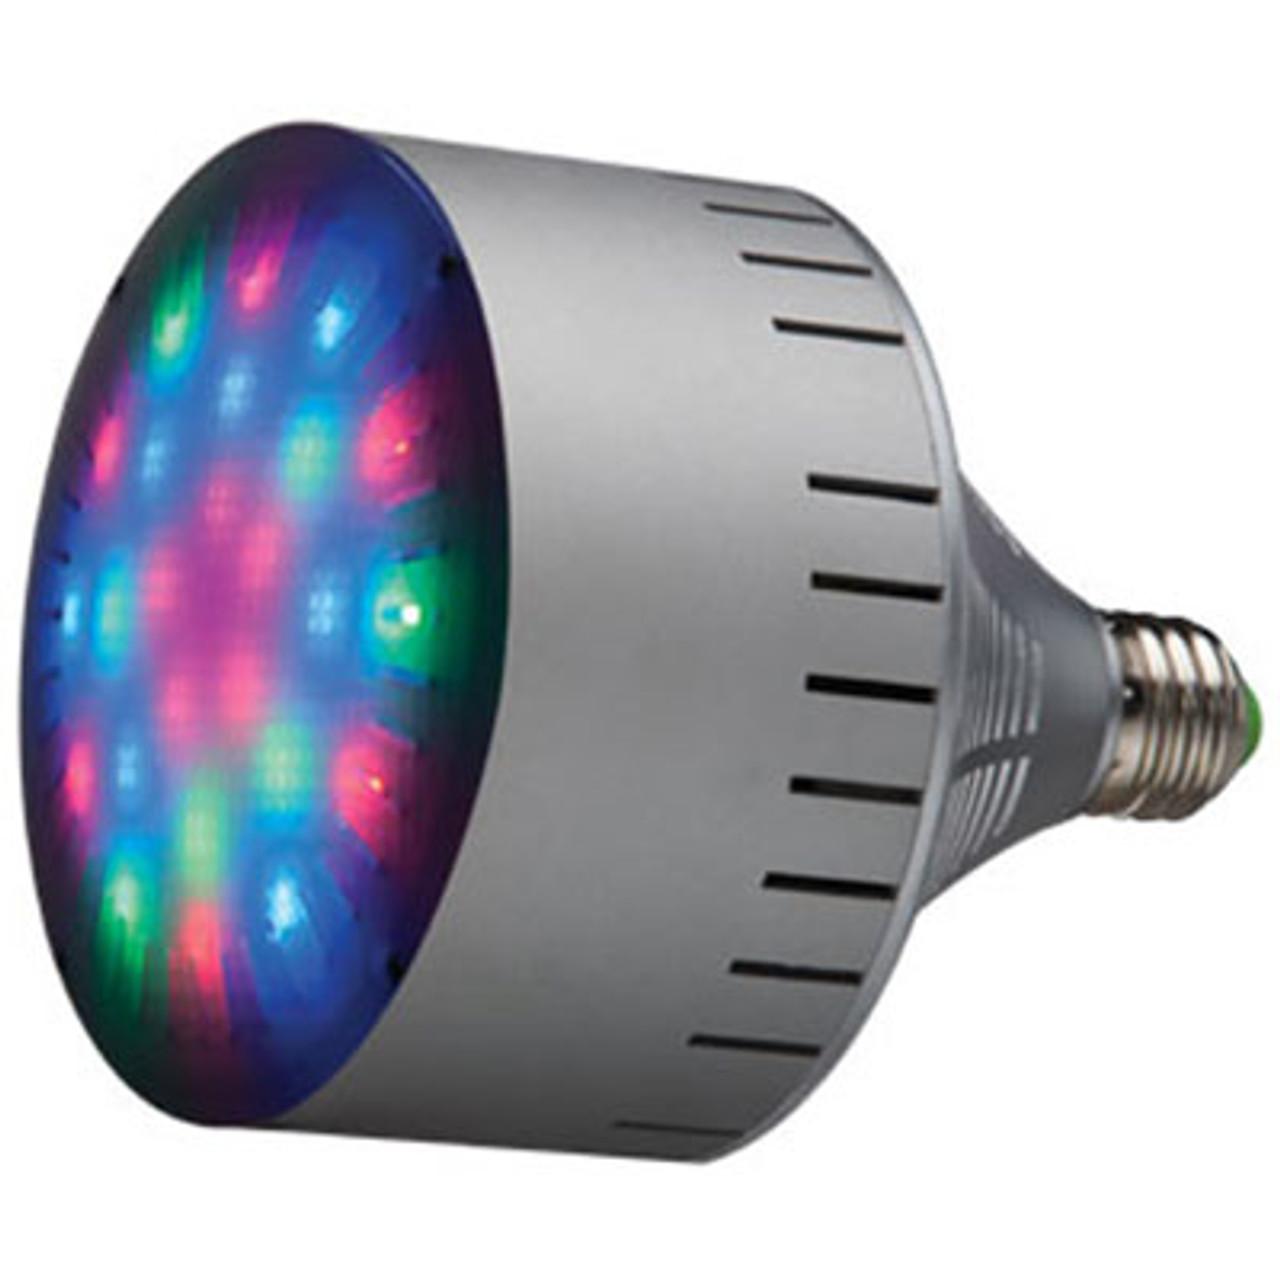 LED-8055EC 30W, Recessed Can LED PAR38 Retrofit for Pool/Spa